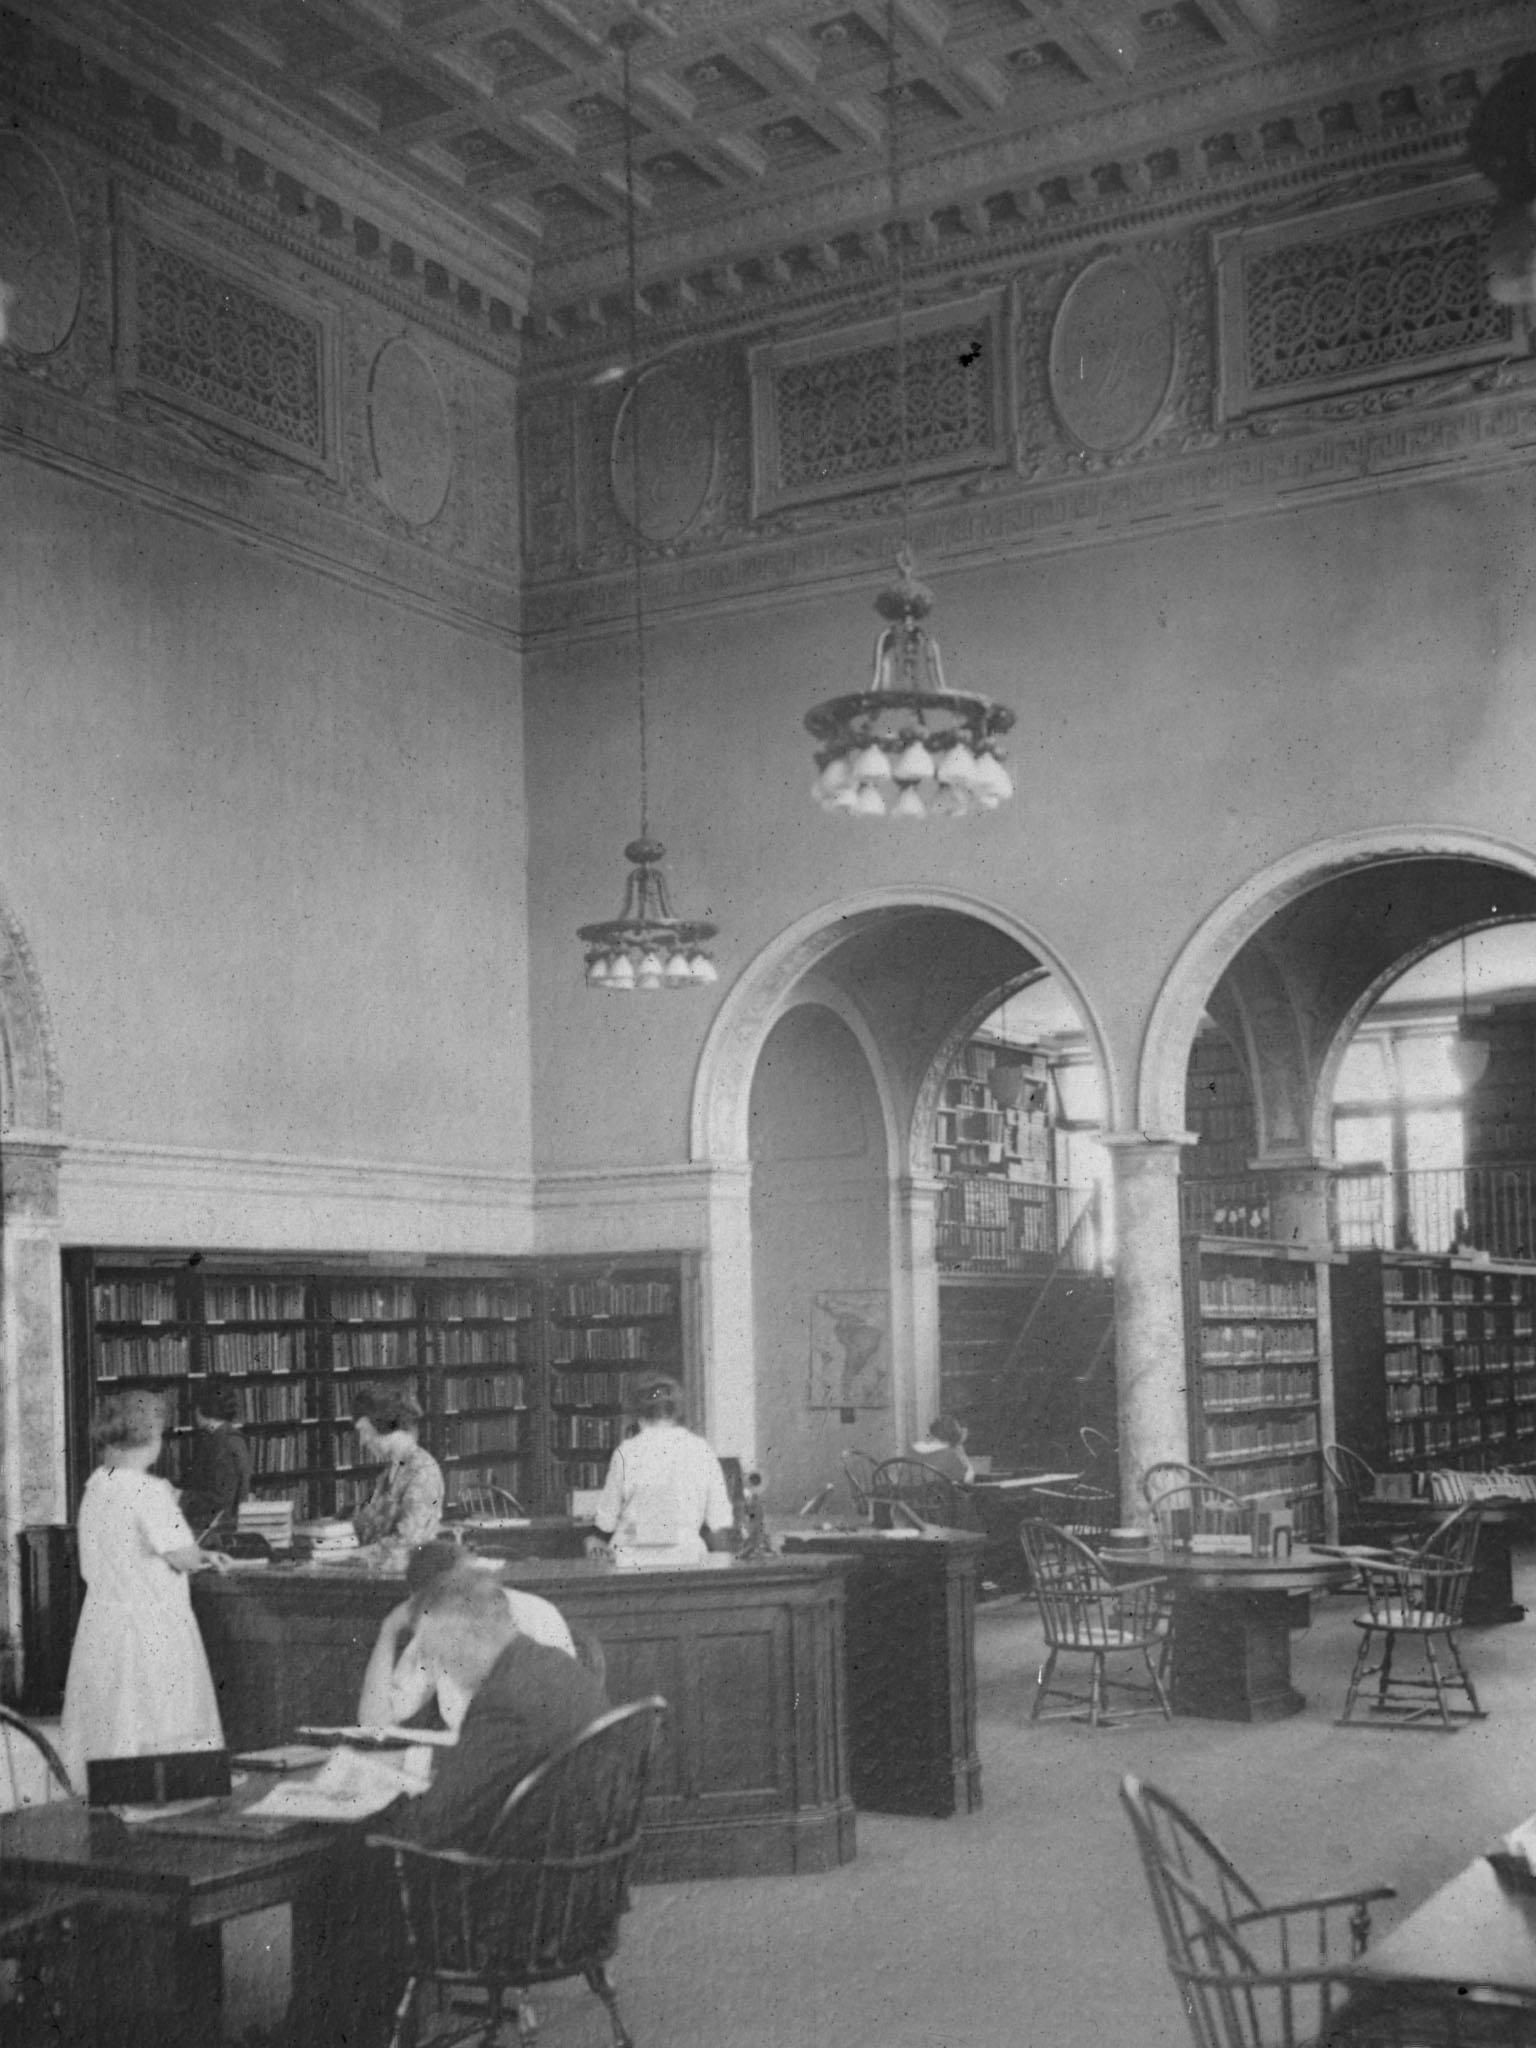 Interior of Cooper Library